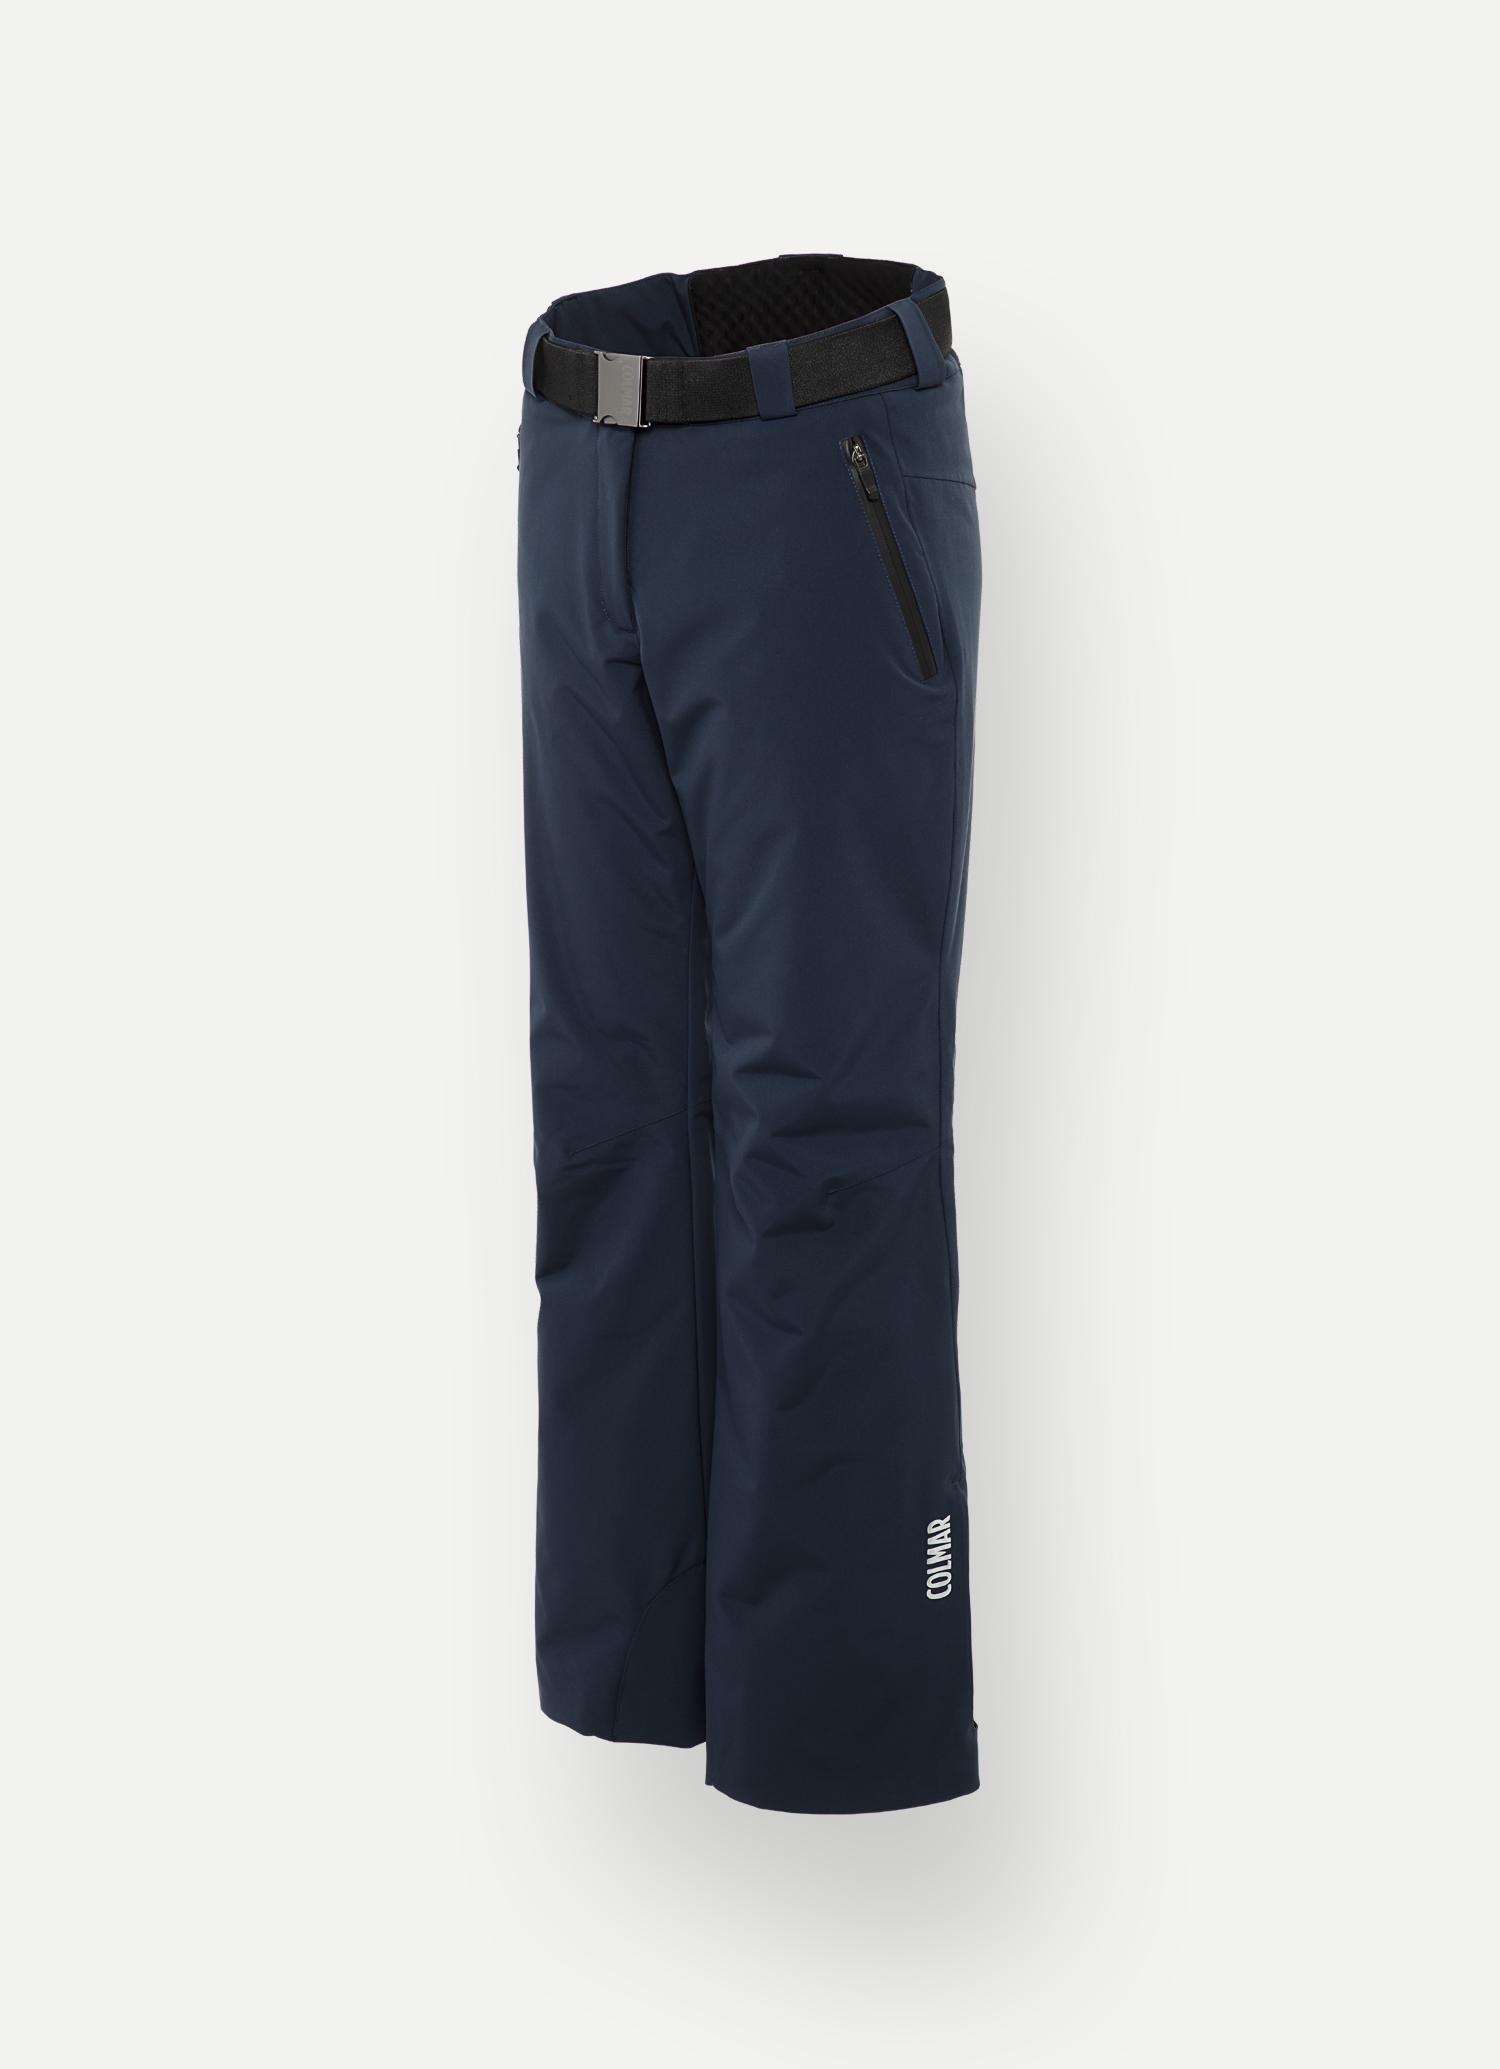 Colmar EVOLUTION, ženske skijaške hlače, plava